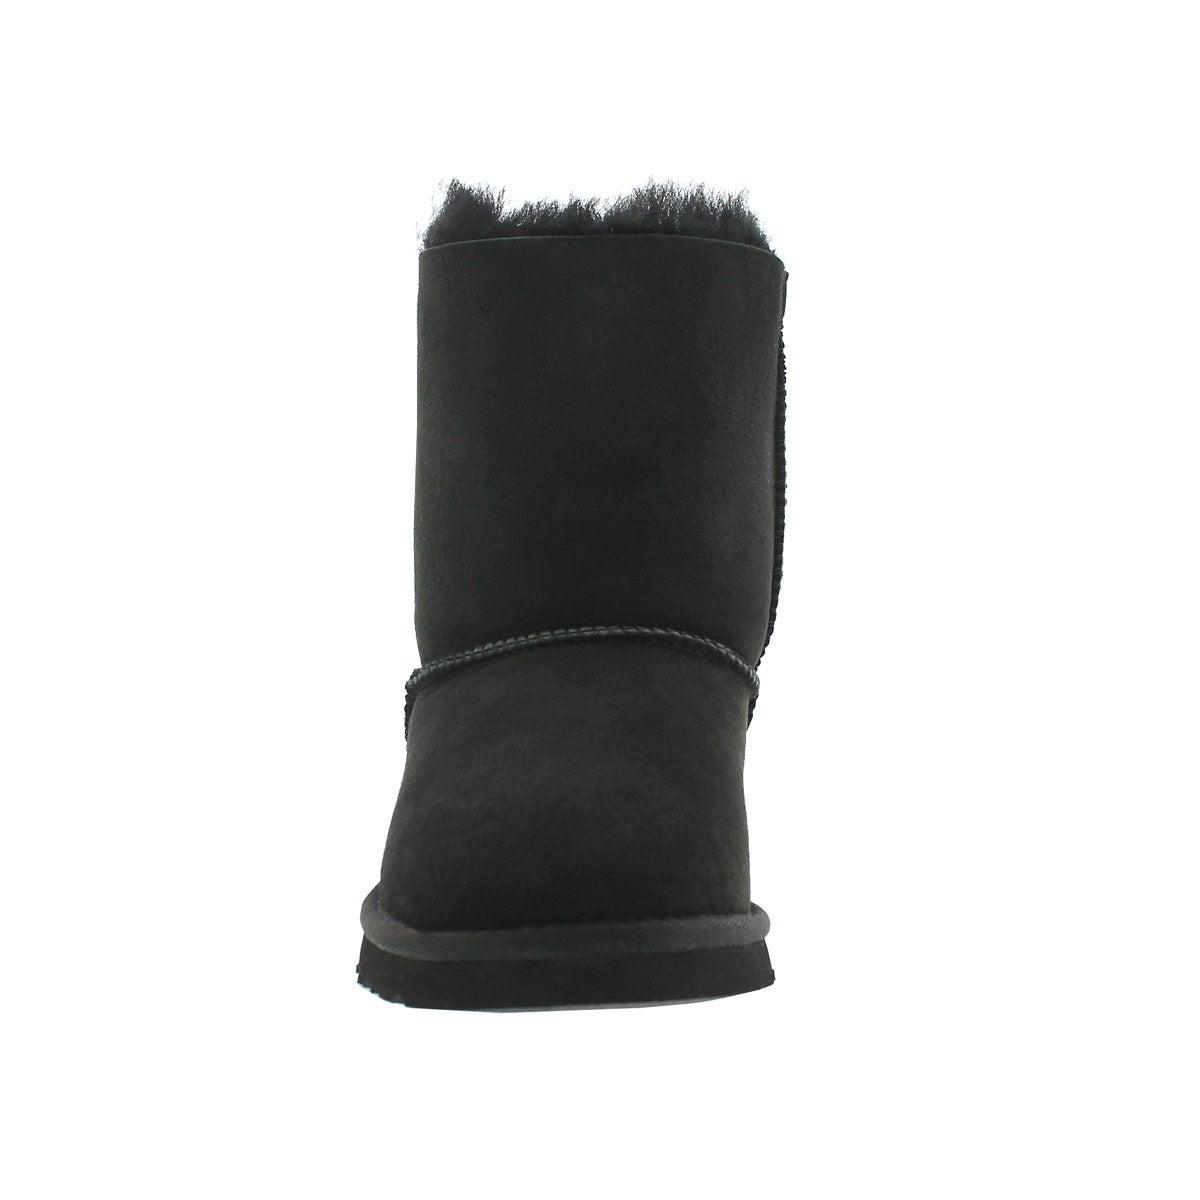 Grls Bailey Bow black sheepskin boot